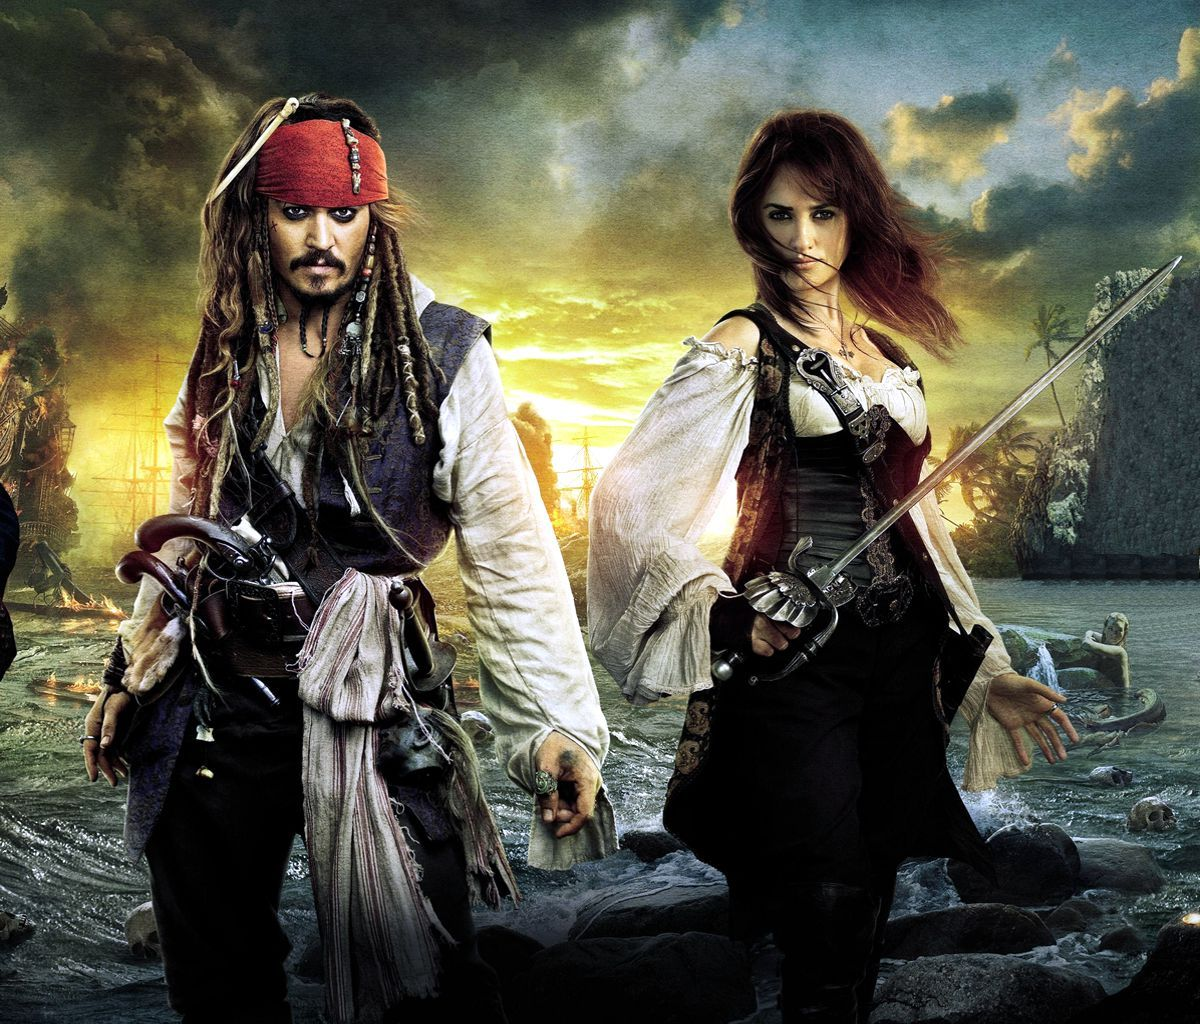 Pirates Of The Caribbean Wallpaper Hd: Penelope Cruz And Johnny Depp In Pirates Of The Caribbean